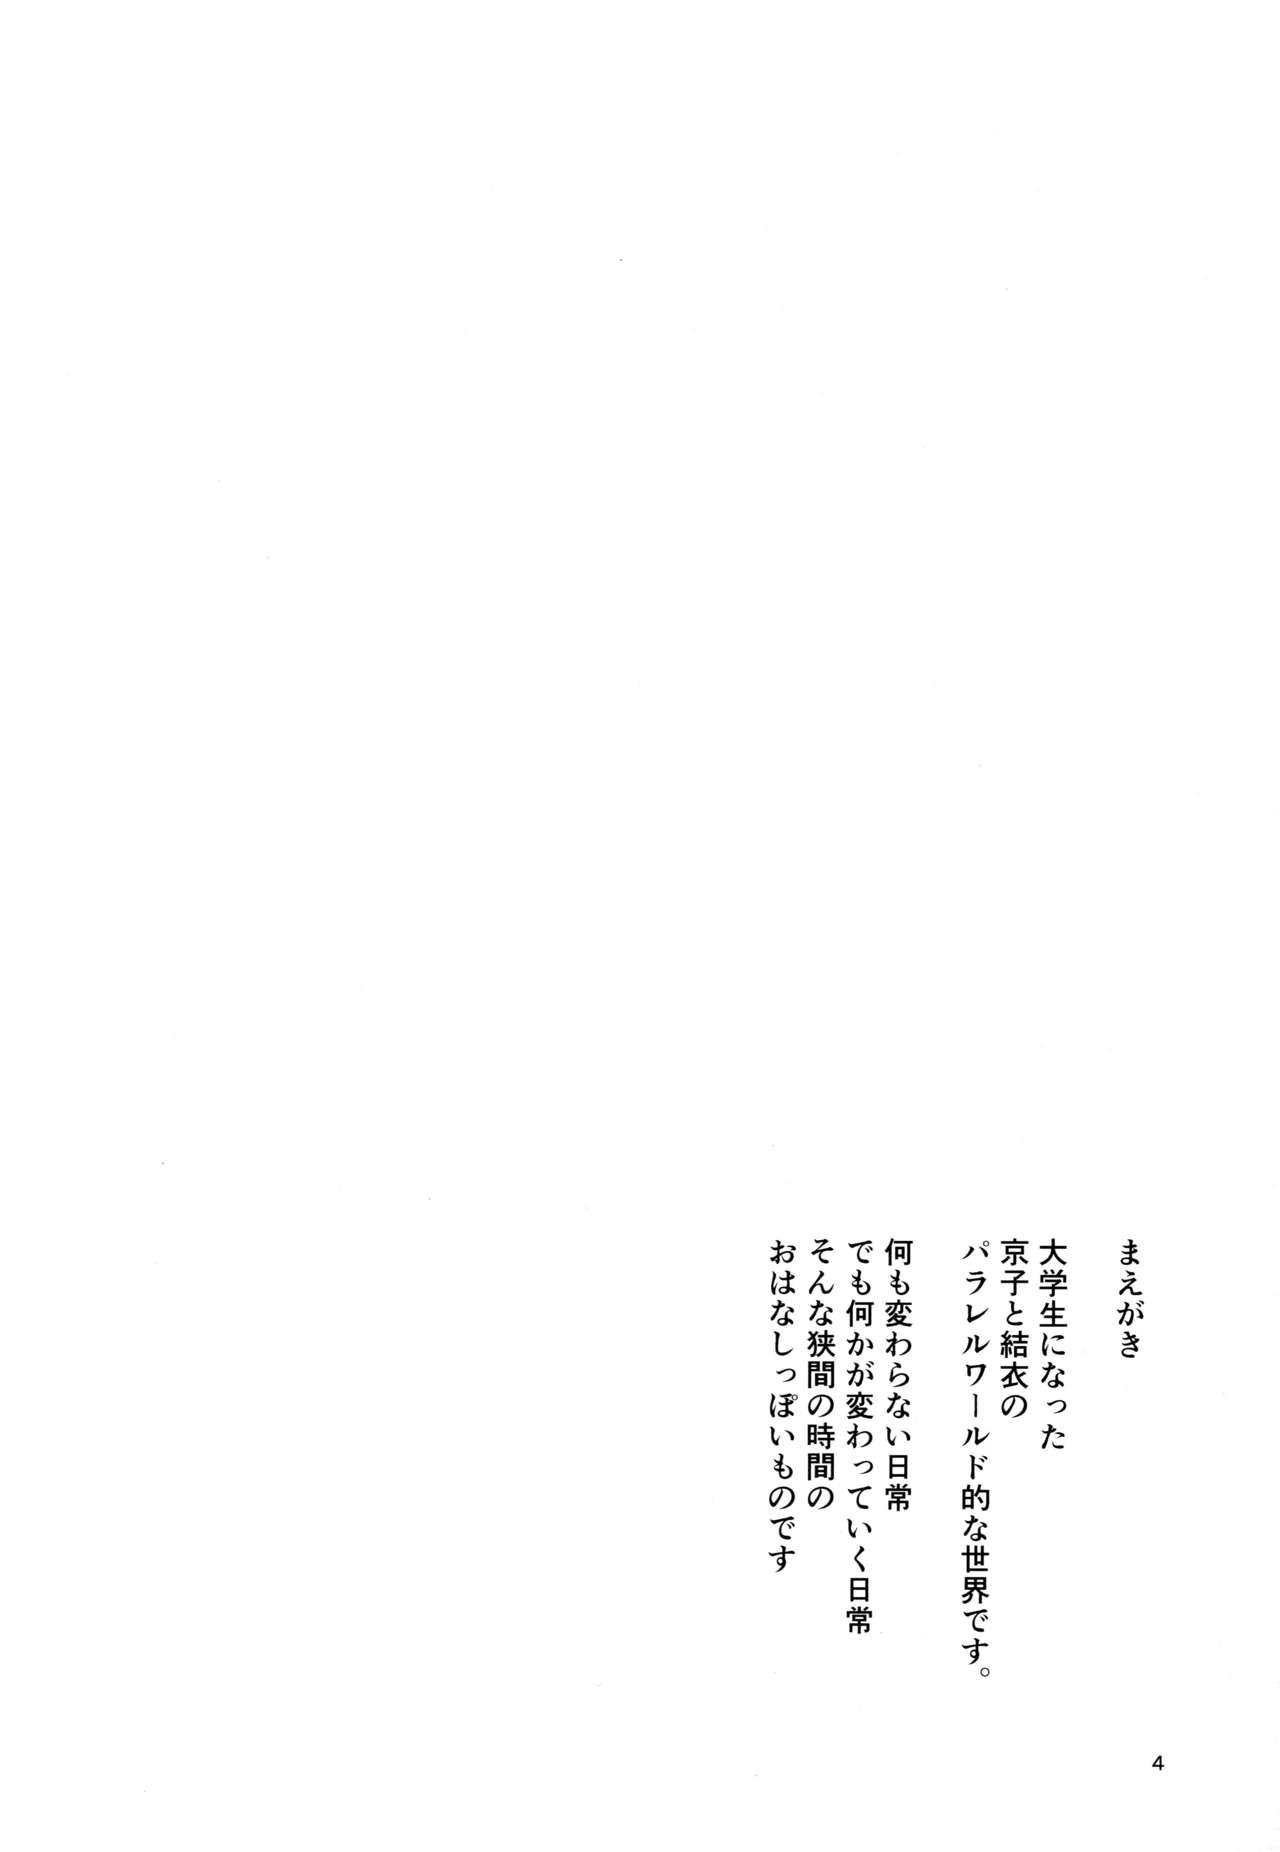 (Girls Love Festival 16) [G-complex (YUI_7)] Kyou mo Ashita mo Yurui Hibi o - Yui and Kyoko and forever loose day-to-day (YuruYuri) 2